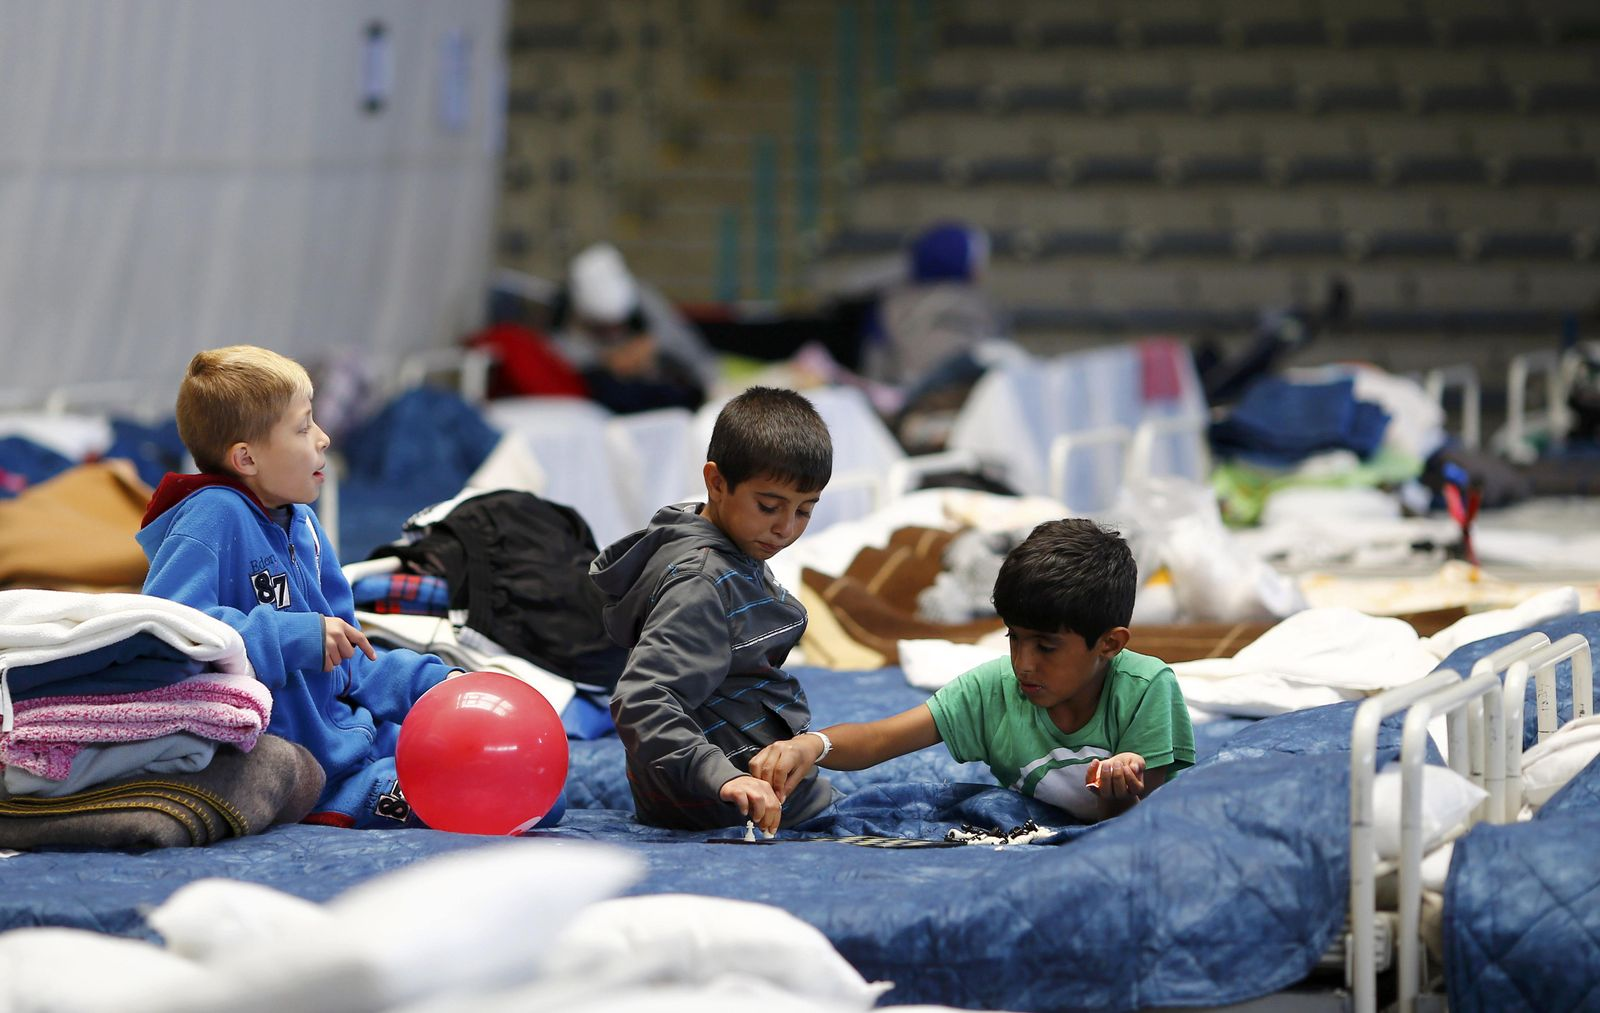 Deutschland/ Hanau/ Migranten/ Kinder